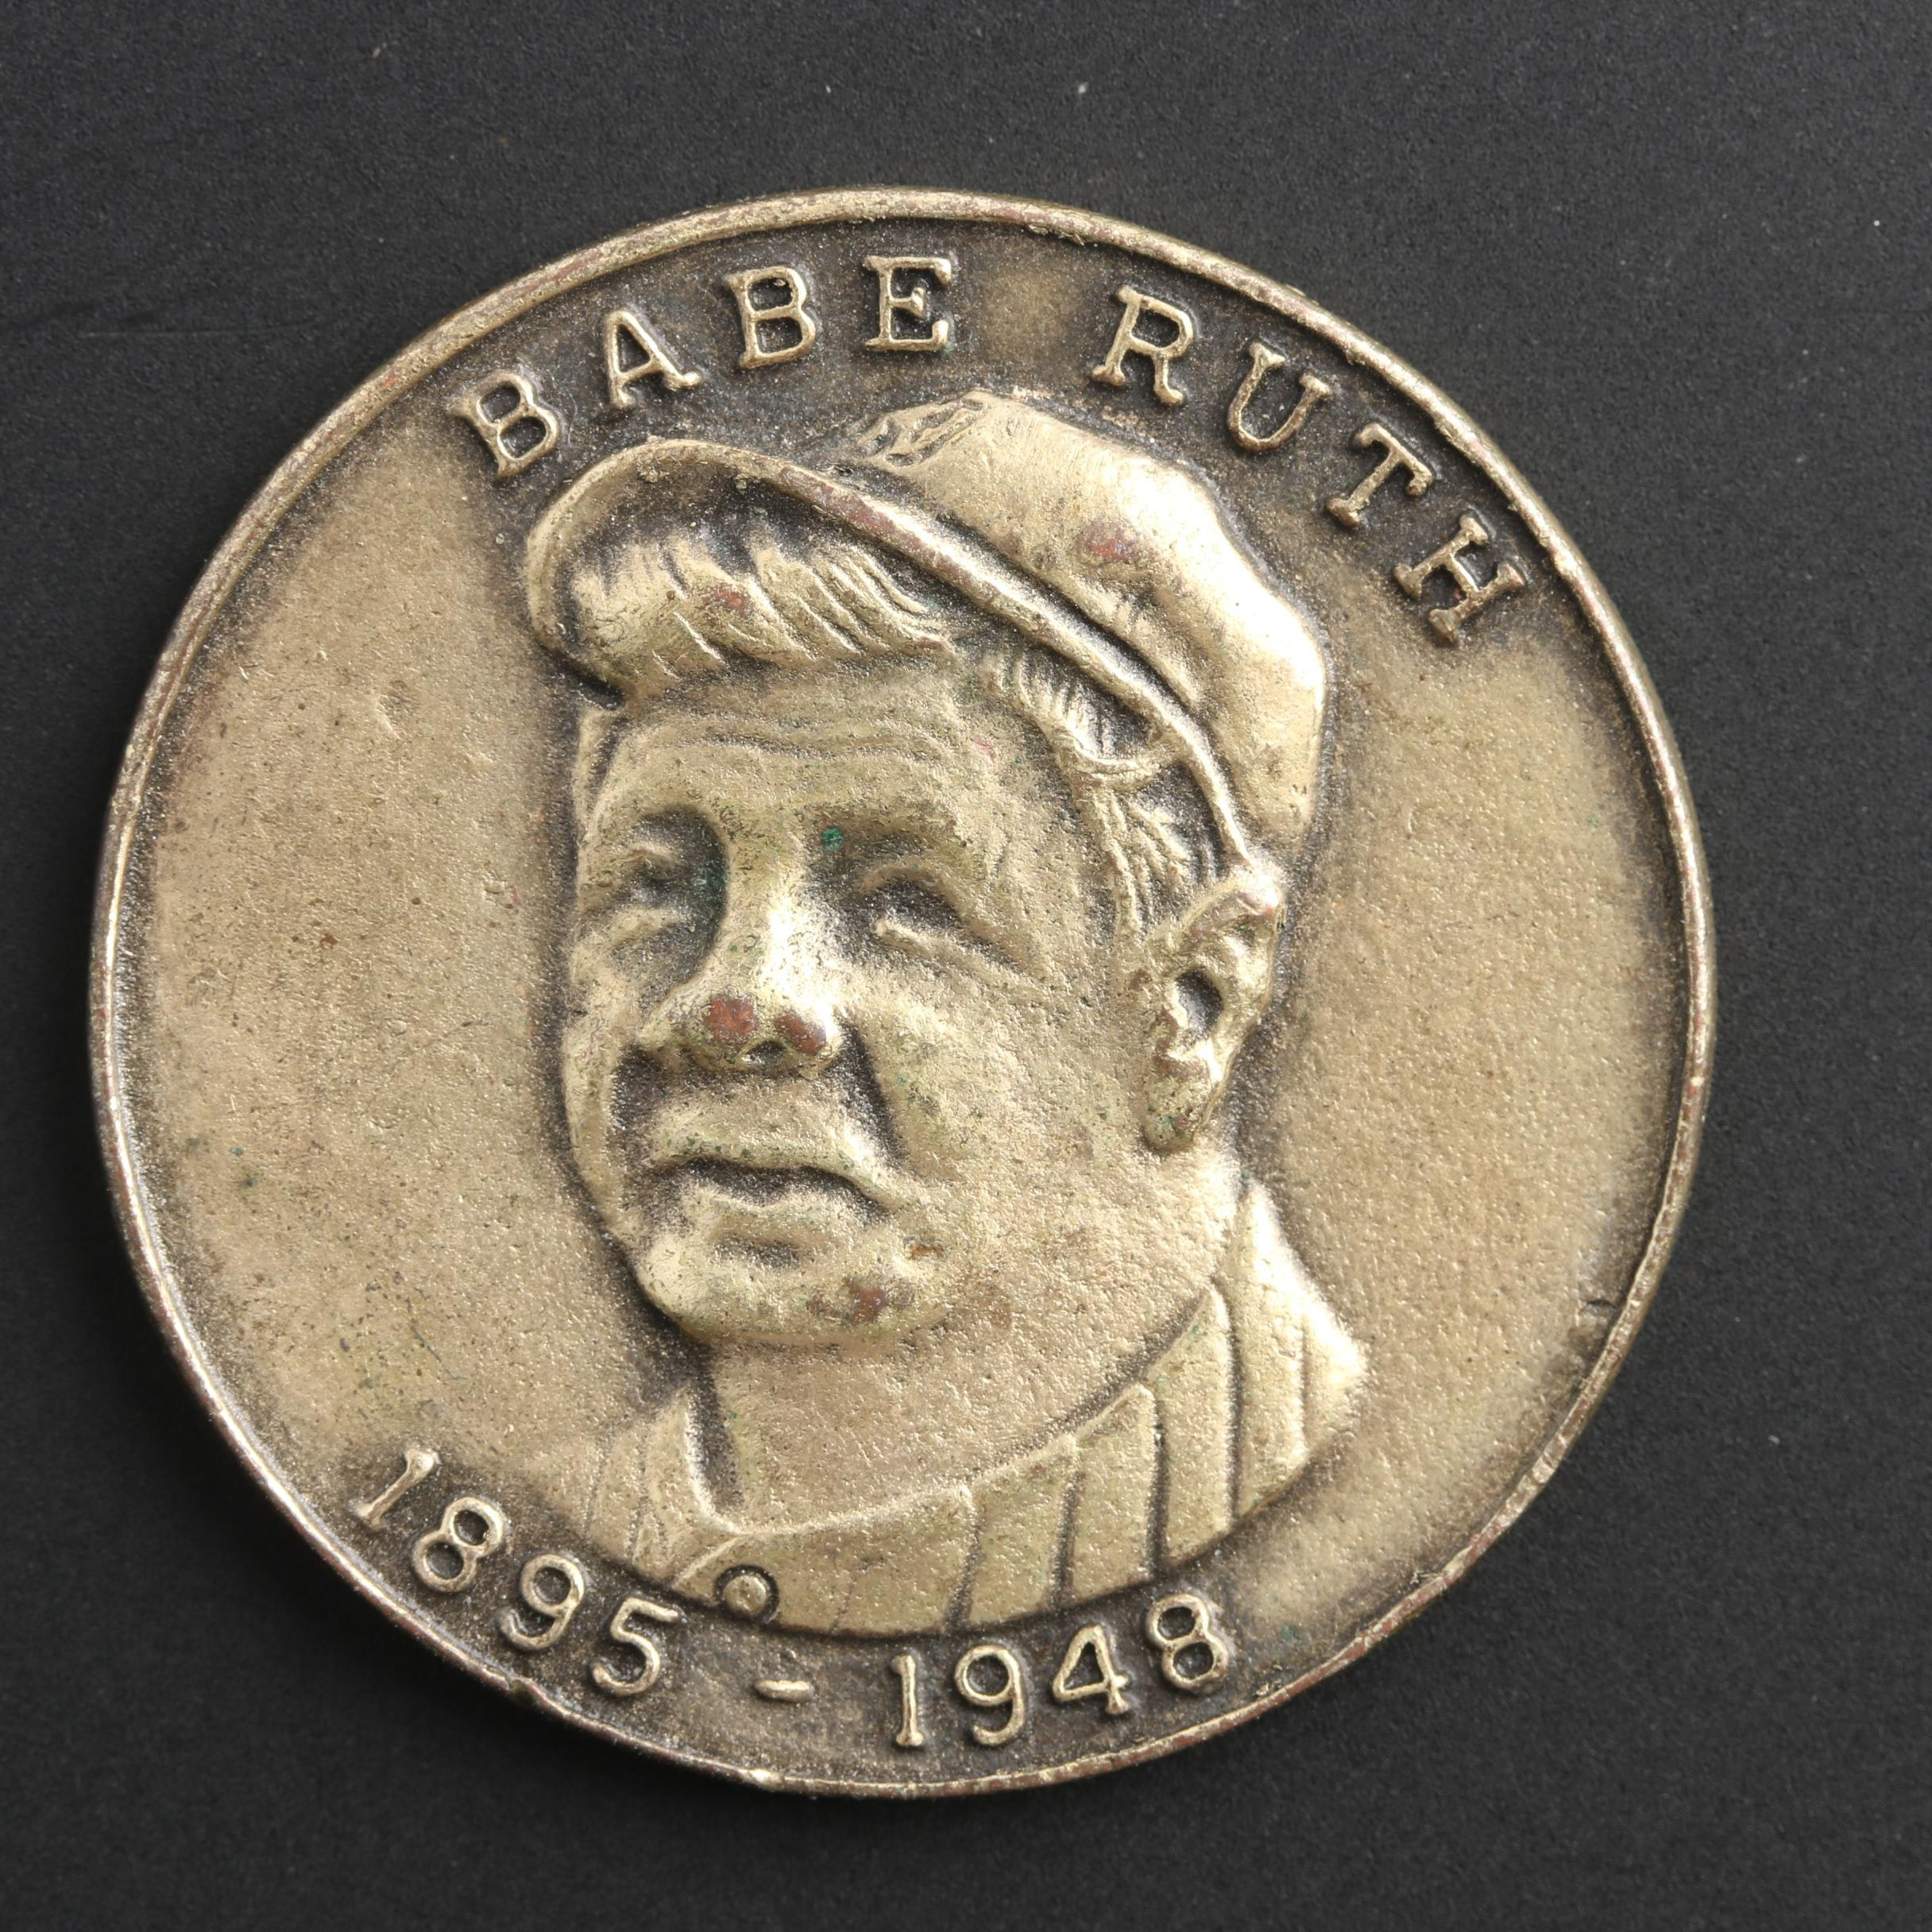 Babe Ruth Commemorative Brass Token